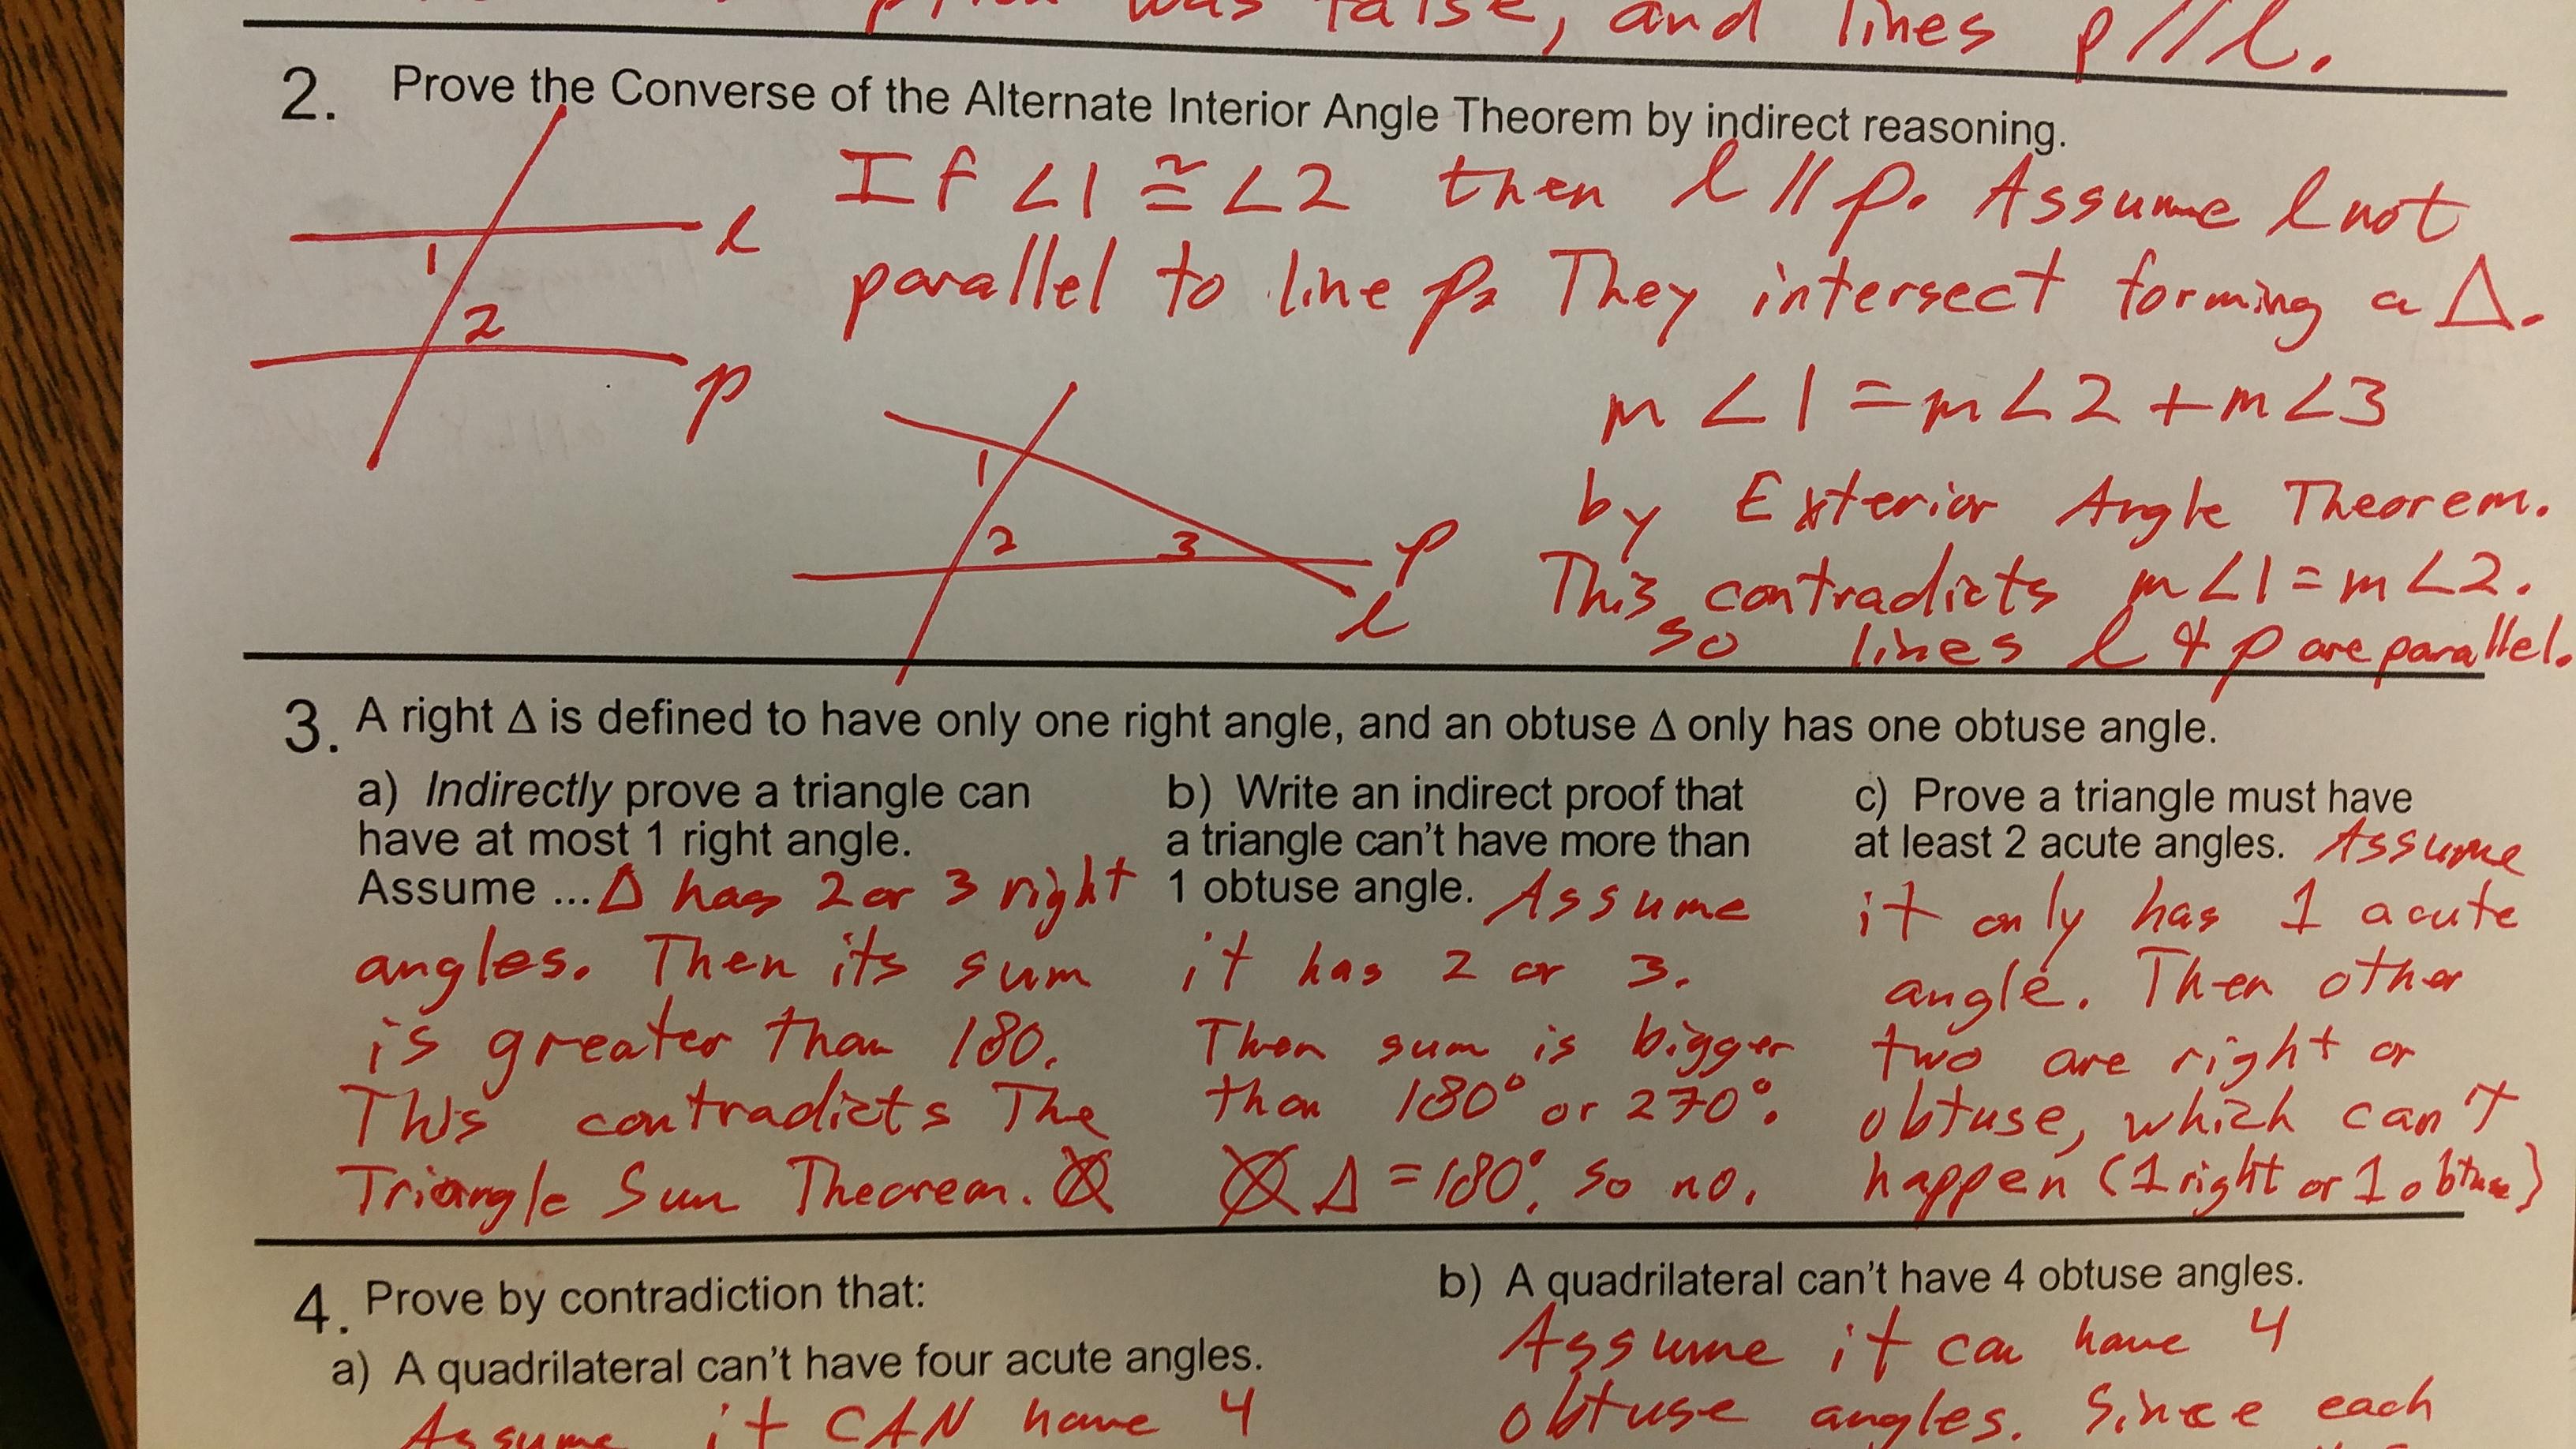 Worksheets Indirect Proof Worksheet With Answers gebhard curt gdownloads indirect reasoning 1 indirect